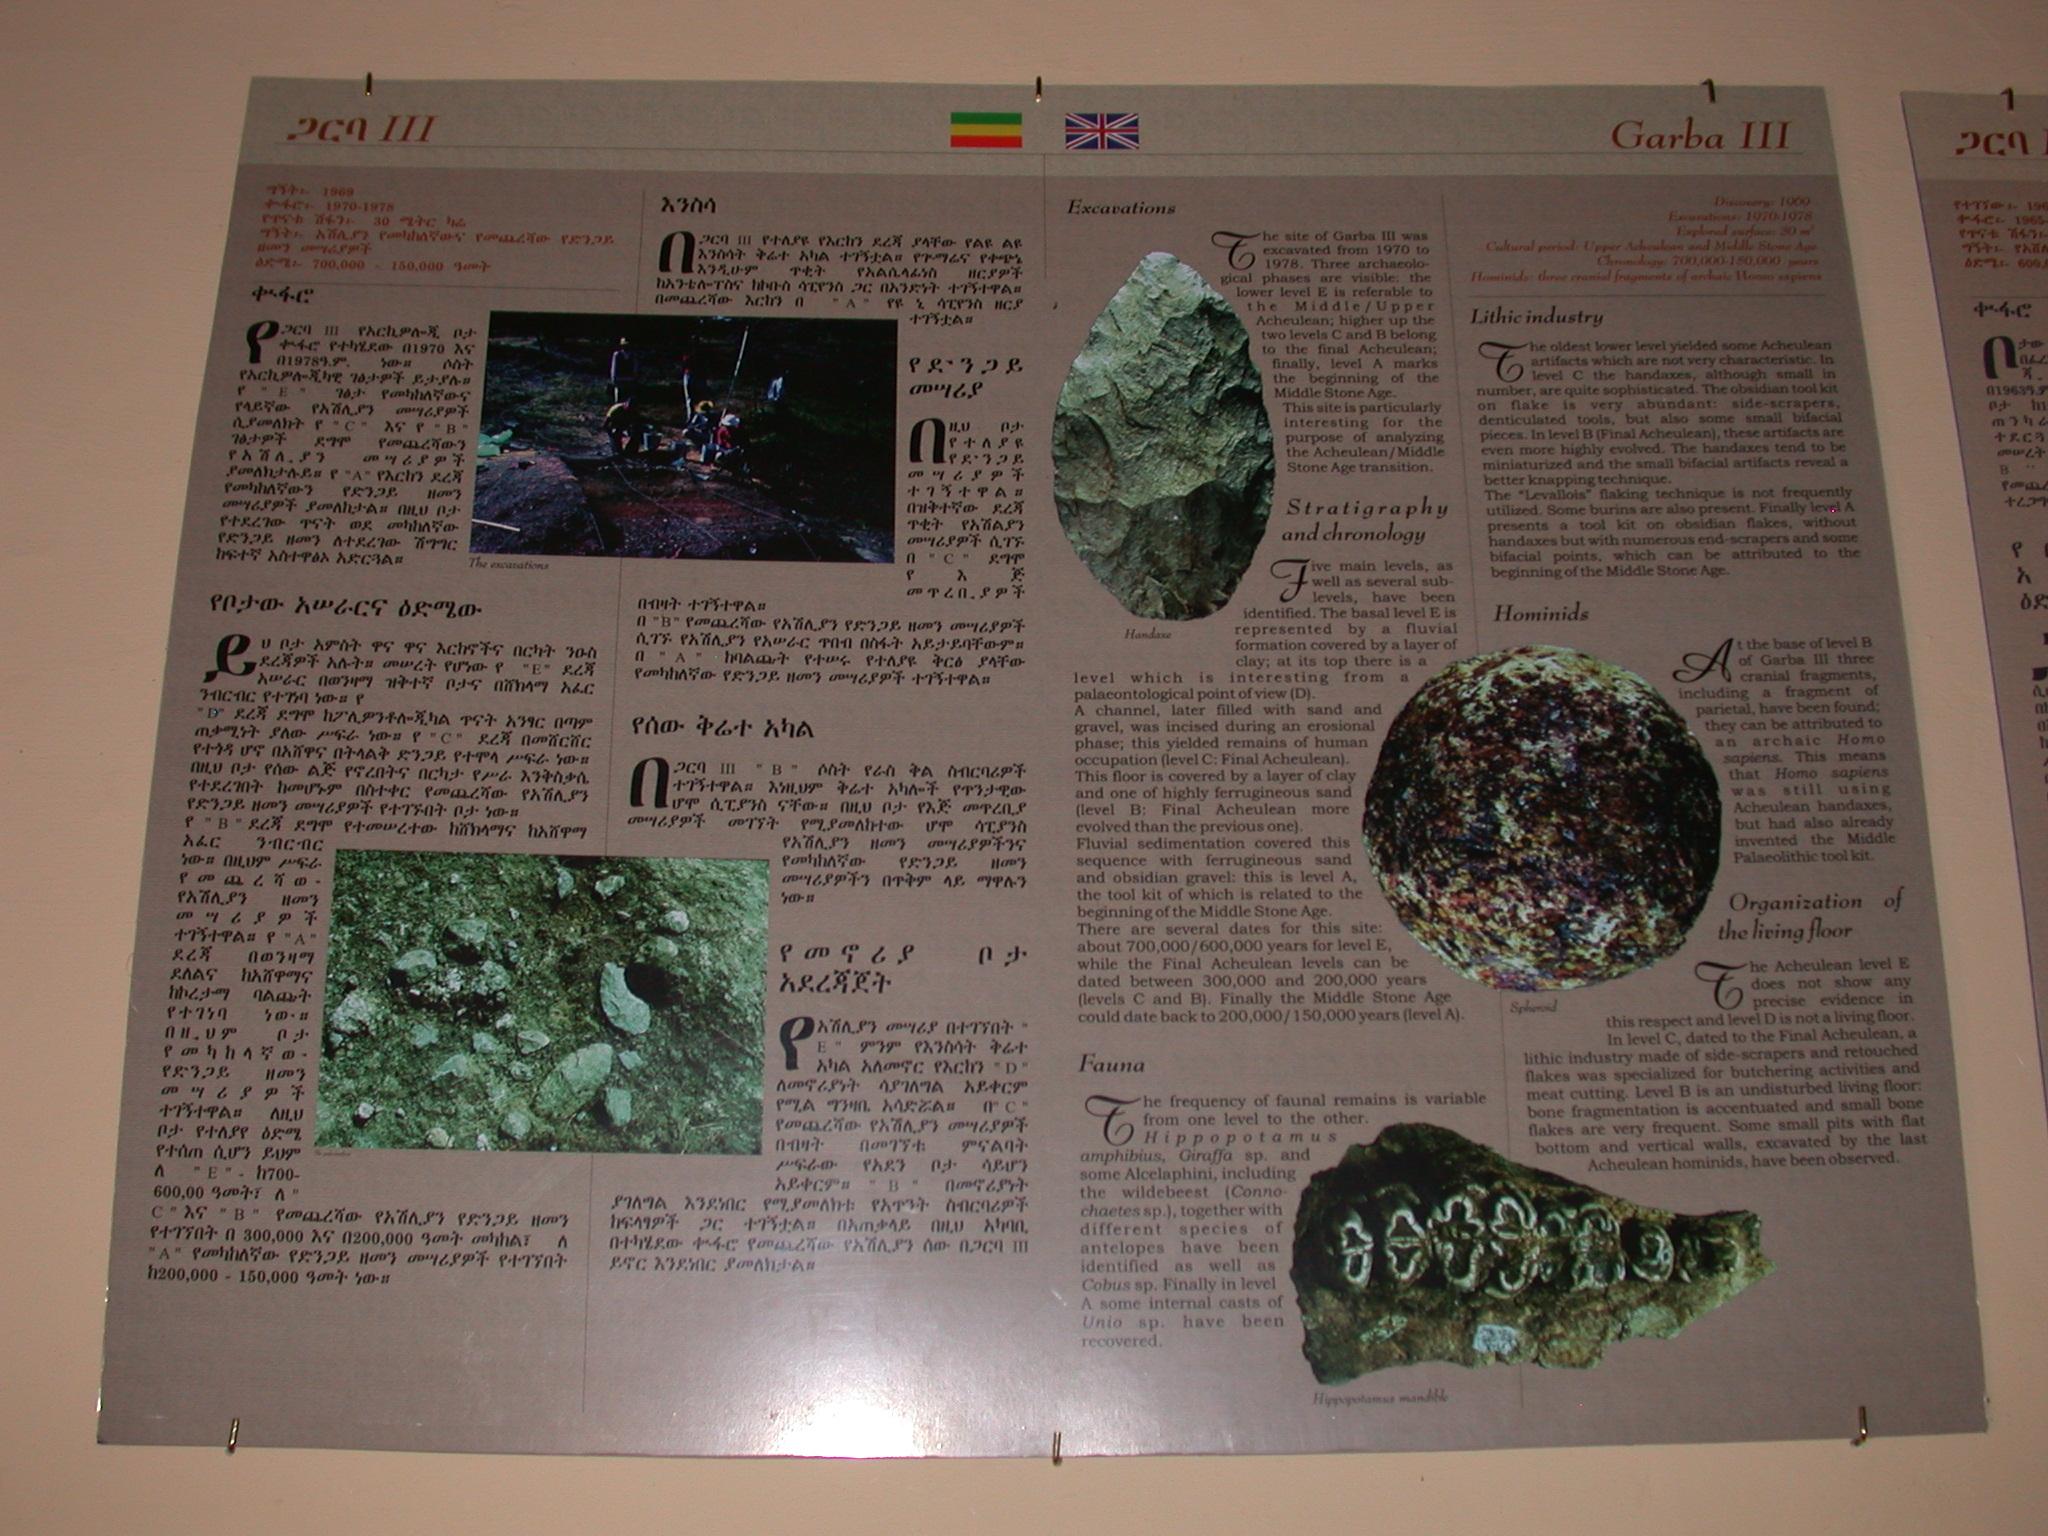 Garba III Tool Poster, Melka Kunture, Ethiopia